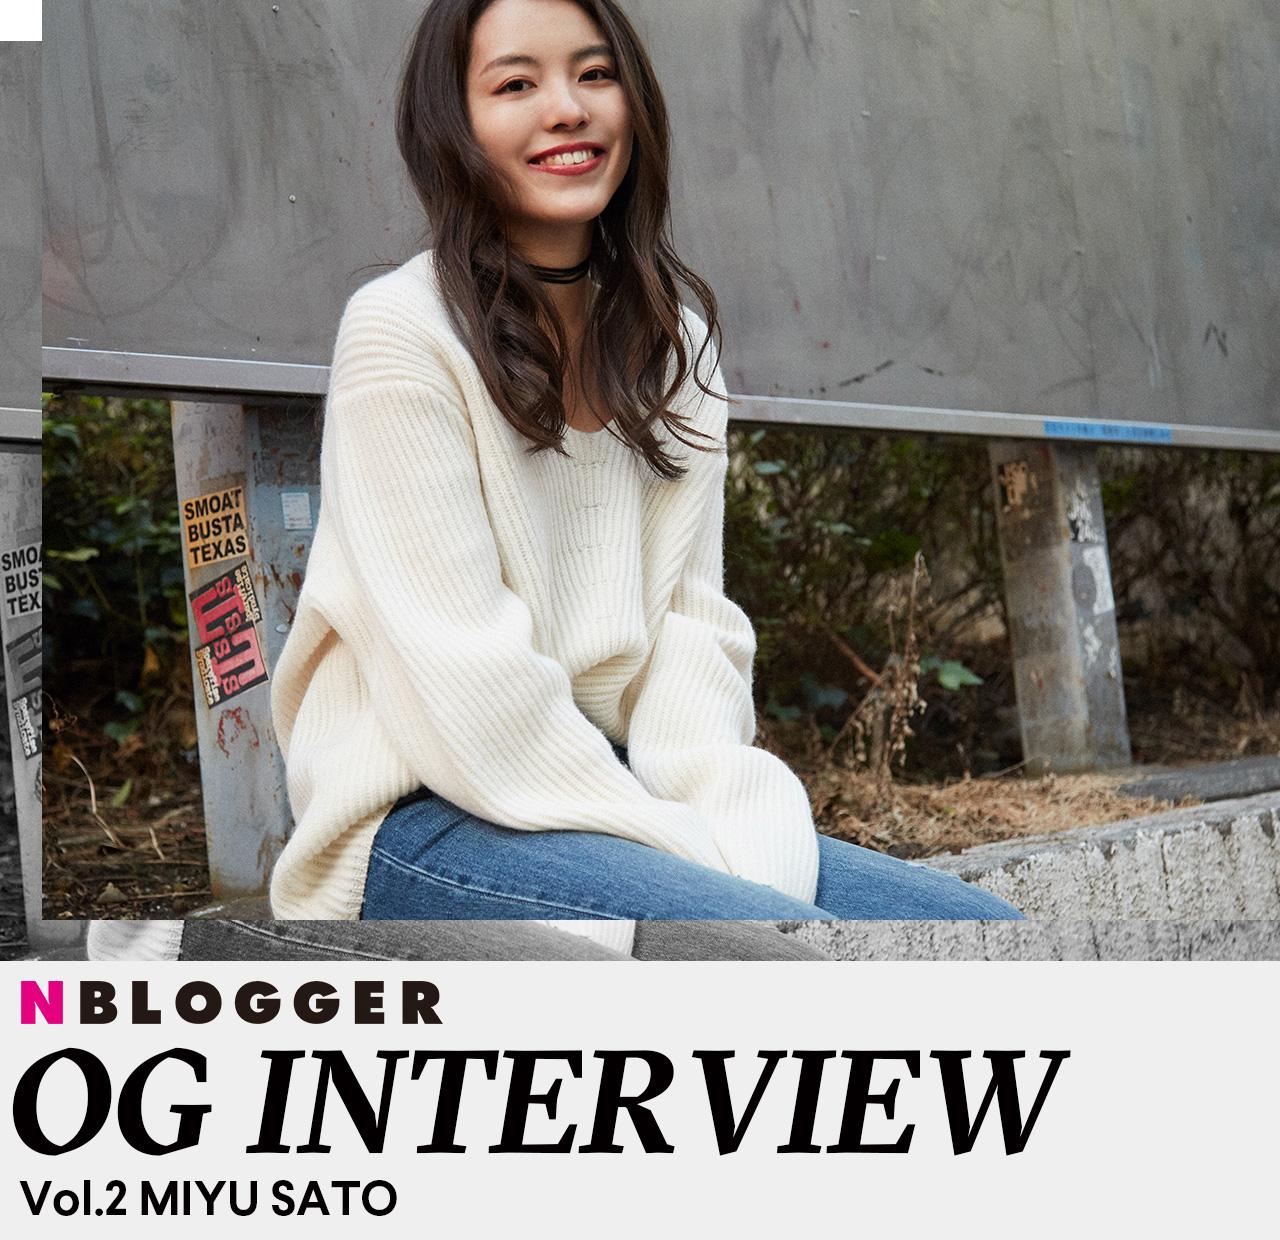 NYLONブロガー6期生オーディションスペシャルコンテンツ 様々な分野で活躍するブロガーOGにインタビュー! Vol.2 佐藤未優